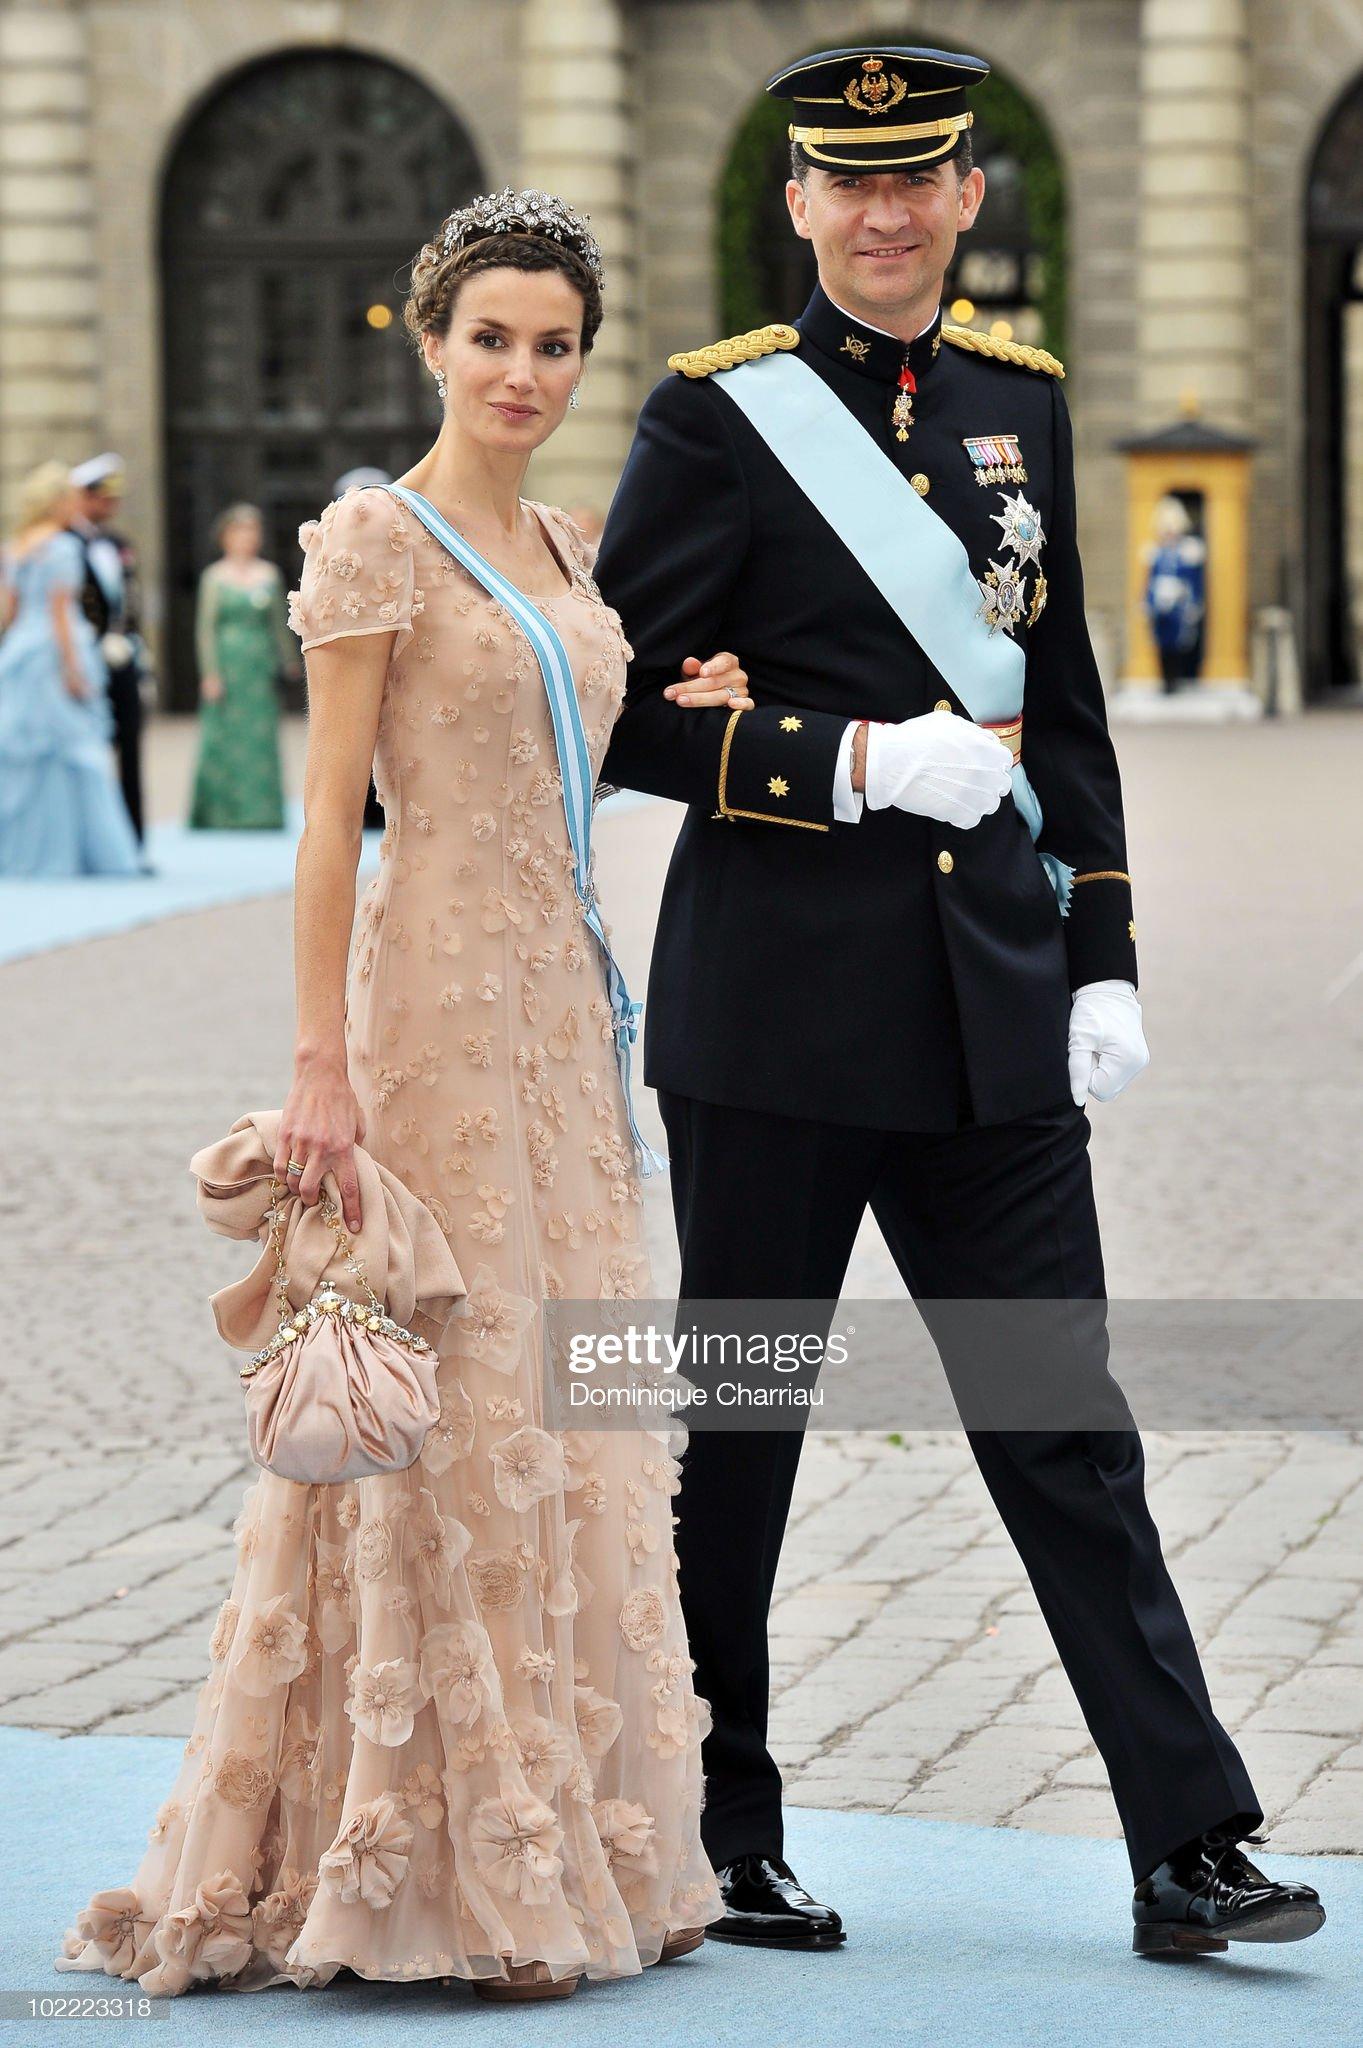 Вечерние наряды Королевы Летиции Wedding Of Swedish Crown Princess Victoria & Daniel Westling - Arrivals : News Photo